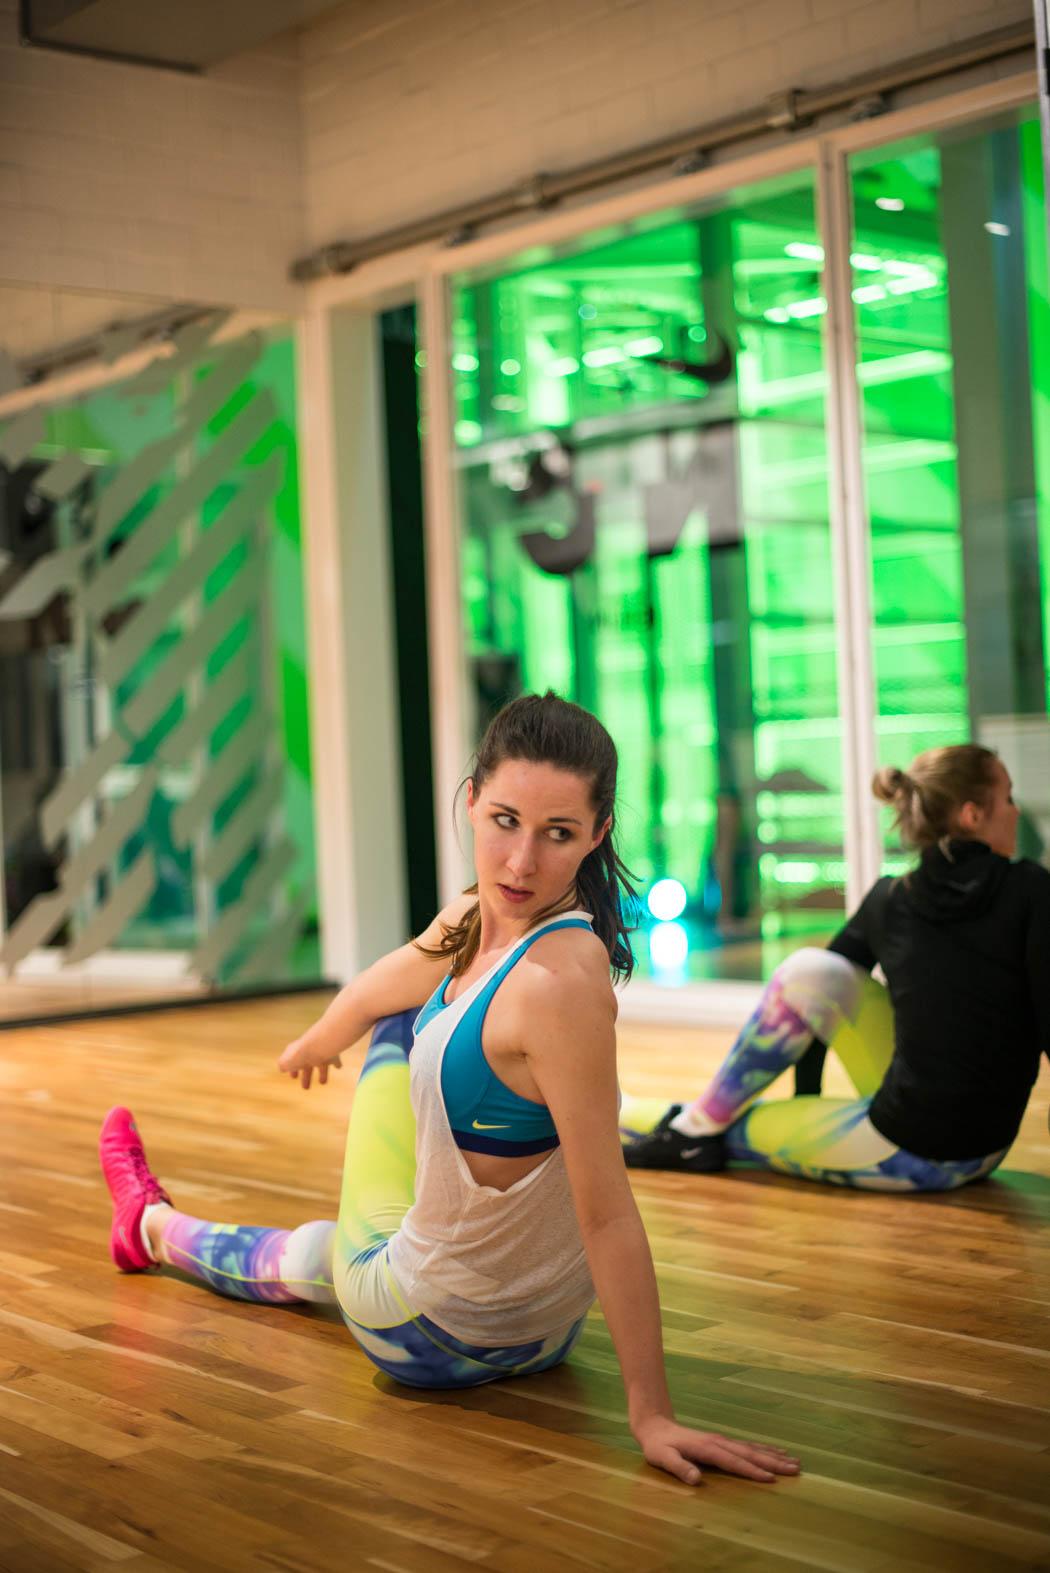 Nike-Lava-Tight-NTC-Training-Berlin-Lindarella-Fitnessblogger-München-Deutschland-9